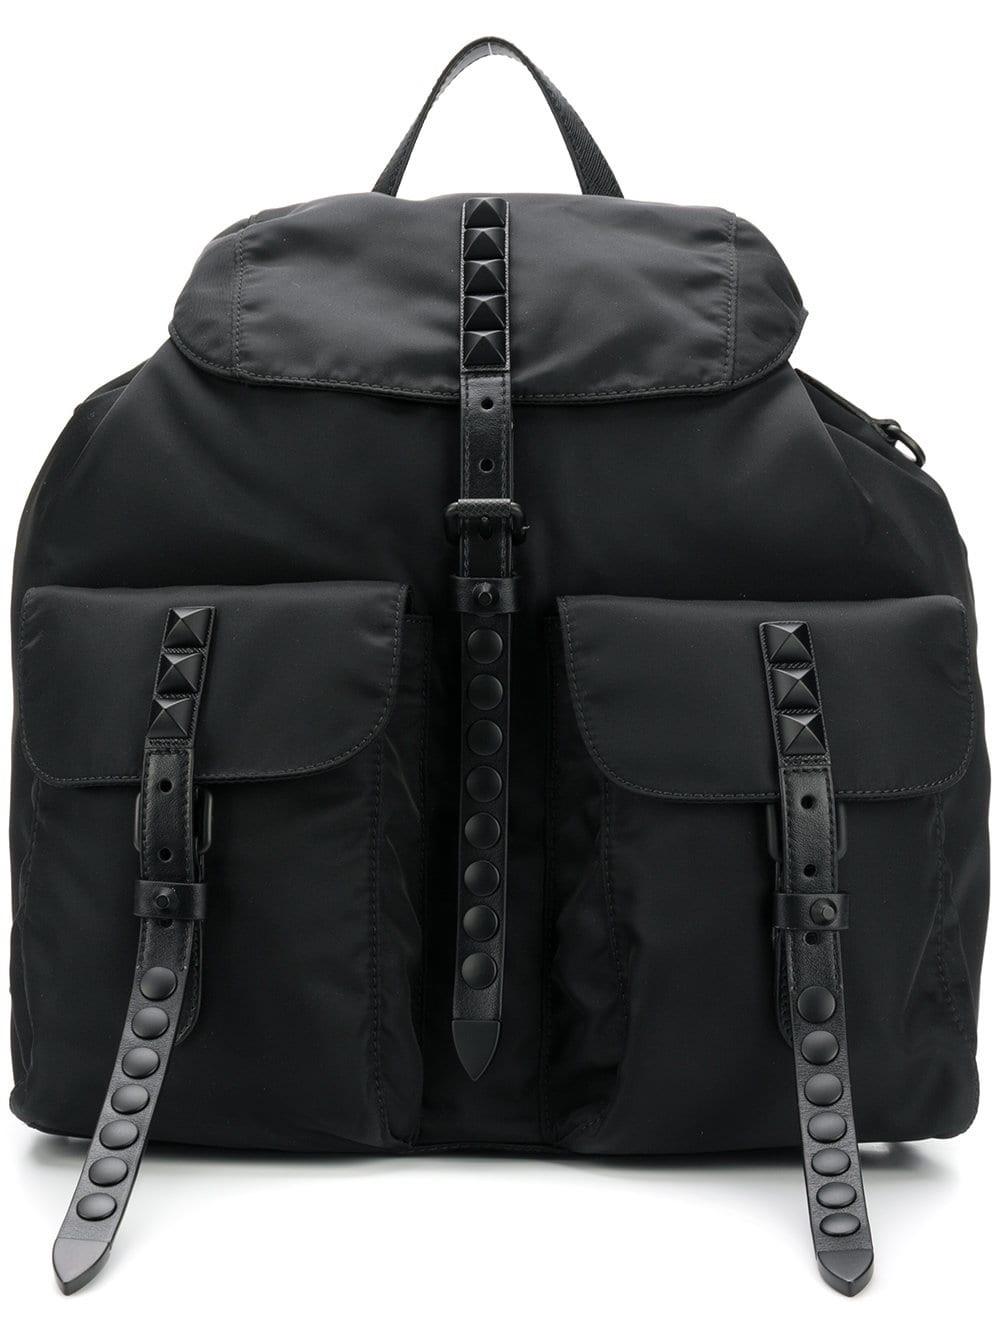 8a63017a8 ... discount code for prada woman backpack 6b451 10246